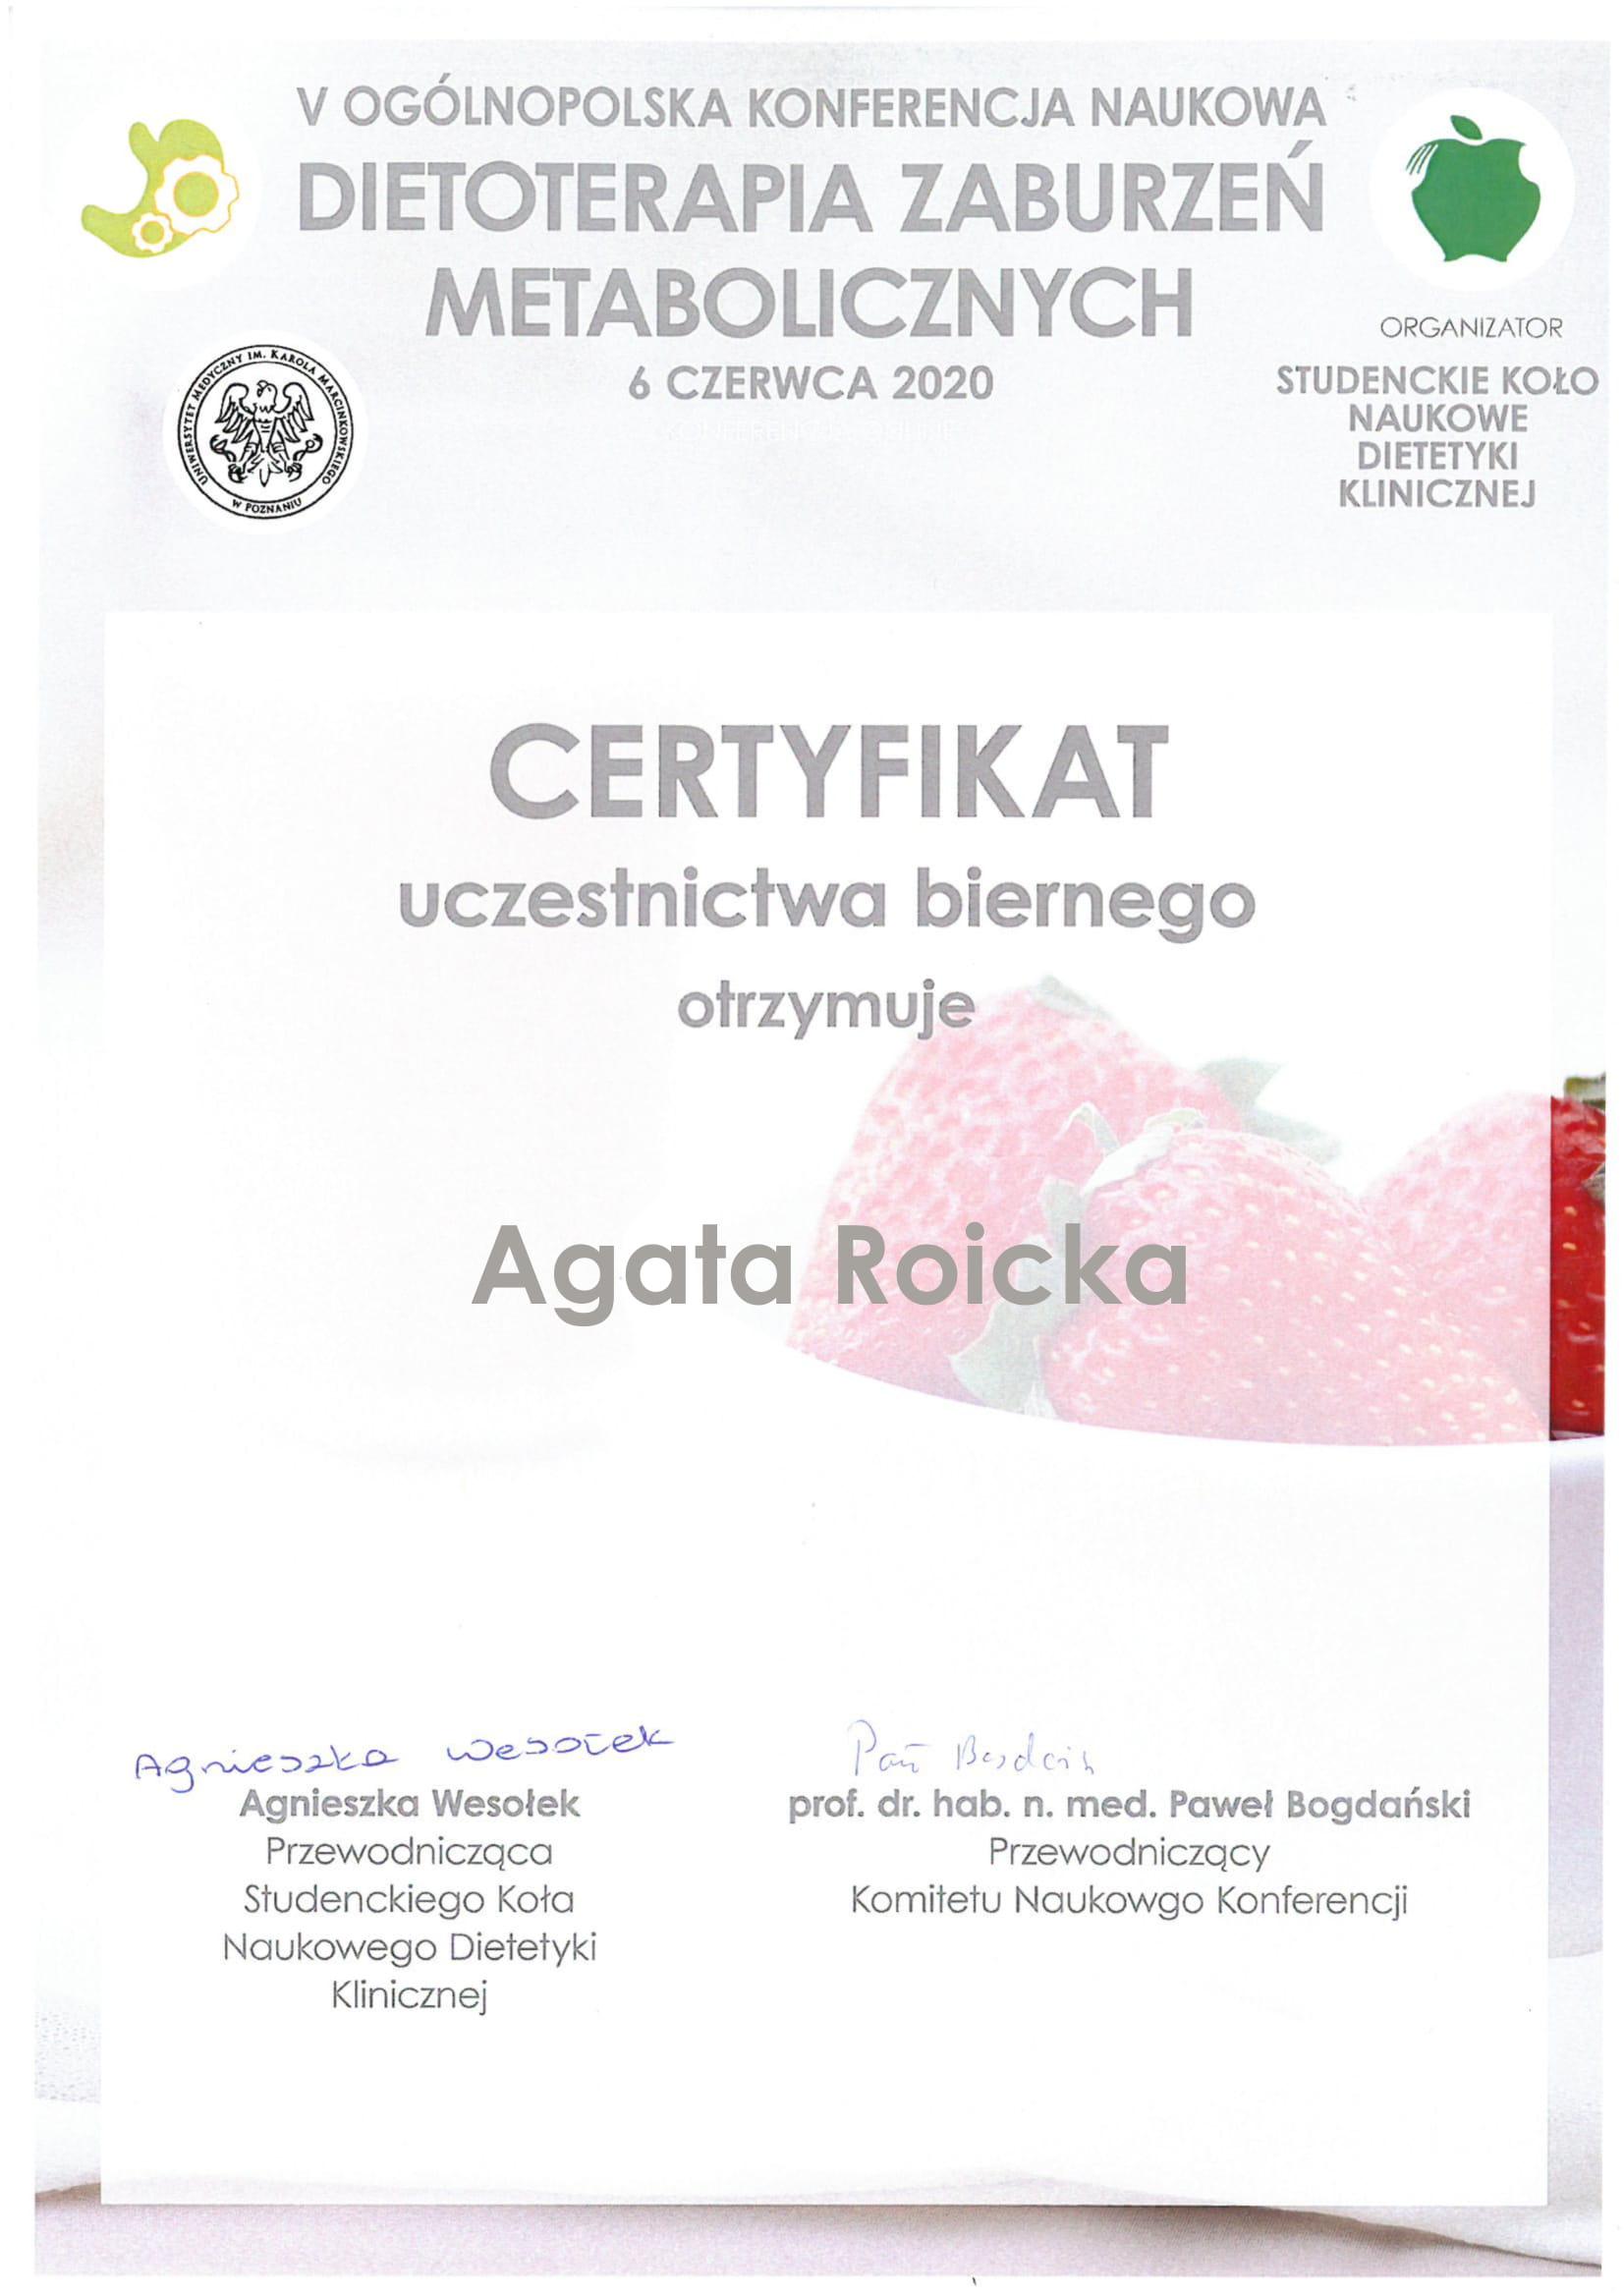 Certyfikat uczestnictwa biernego - Agata Roicka-1